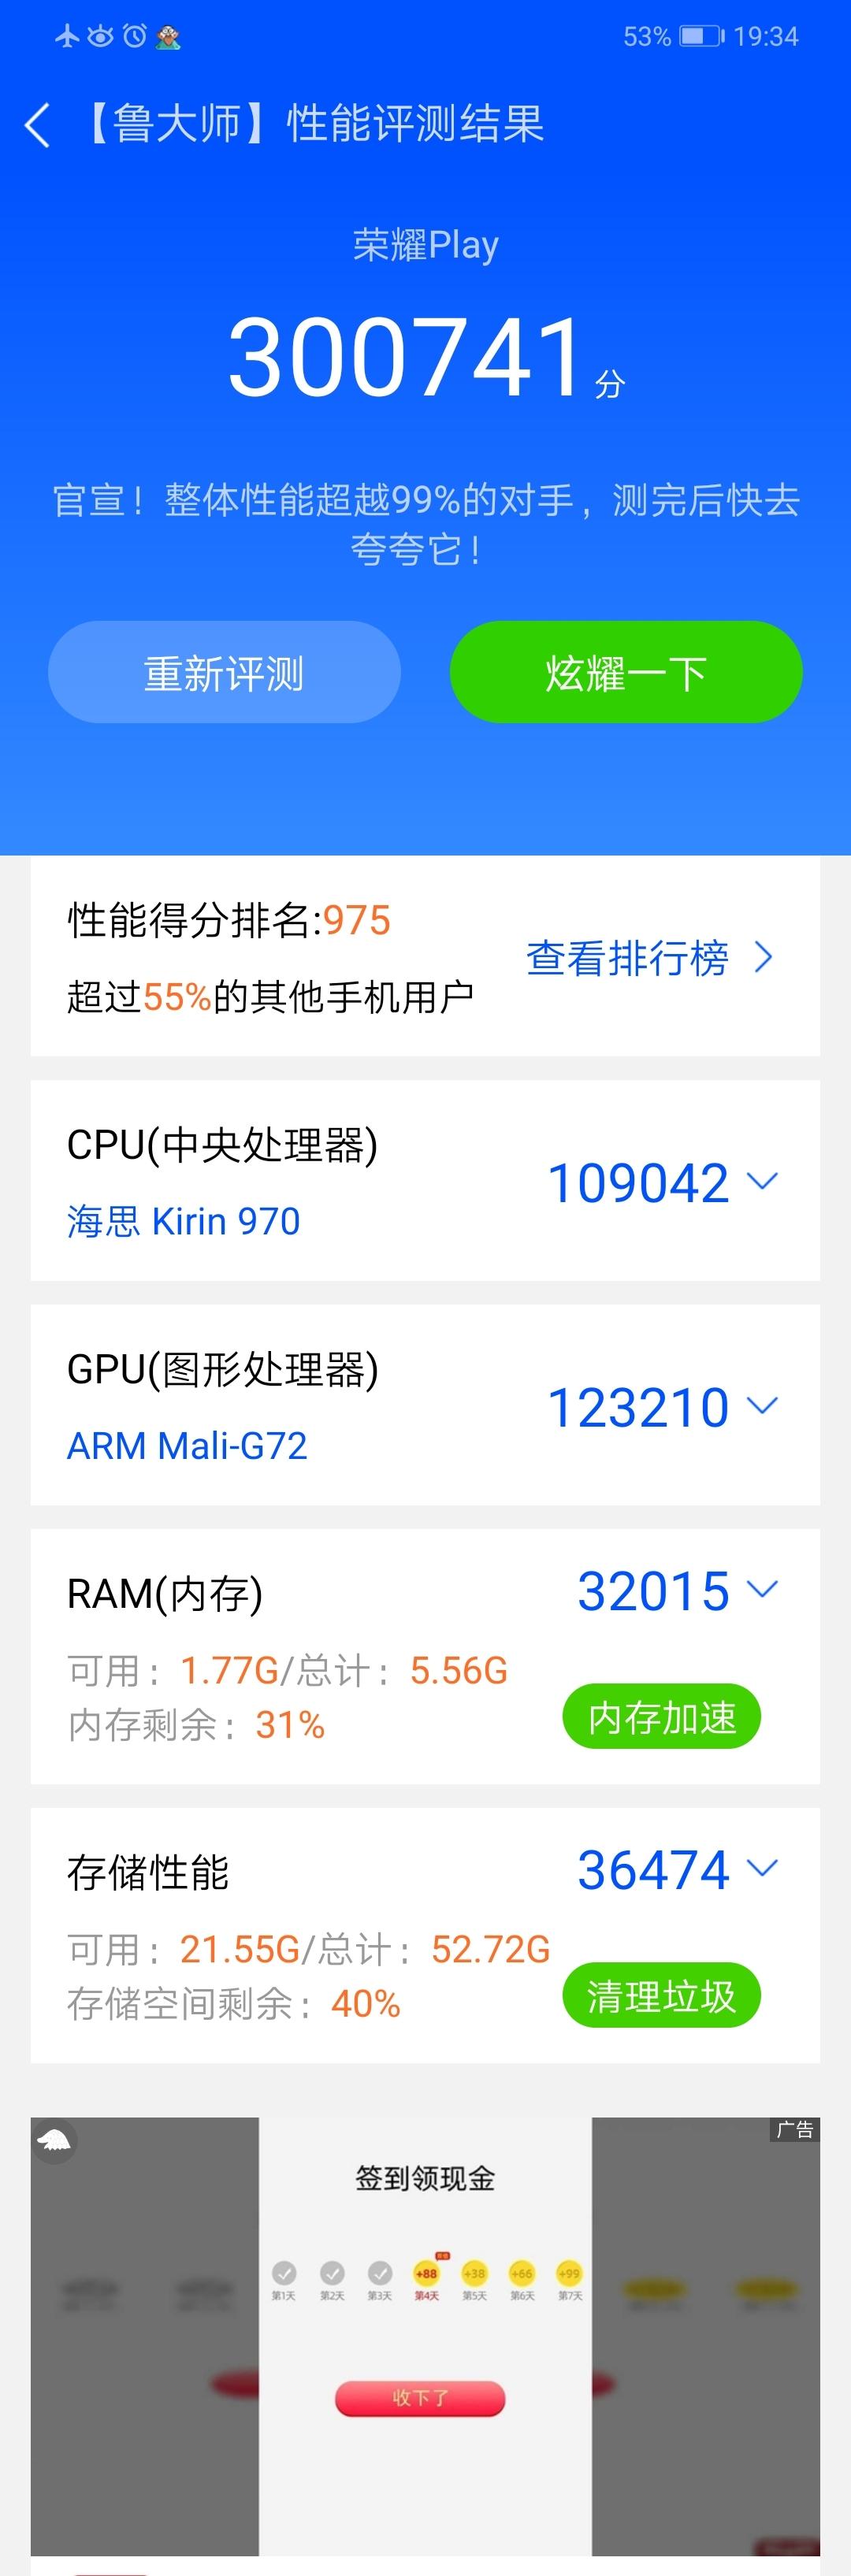 Screenshot_20200508_193449_com.ludashi.benchmark.jpg